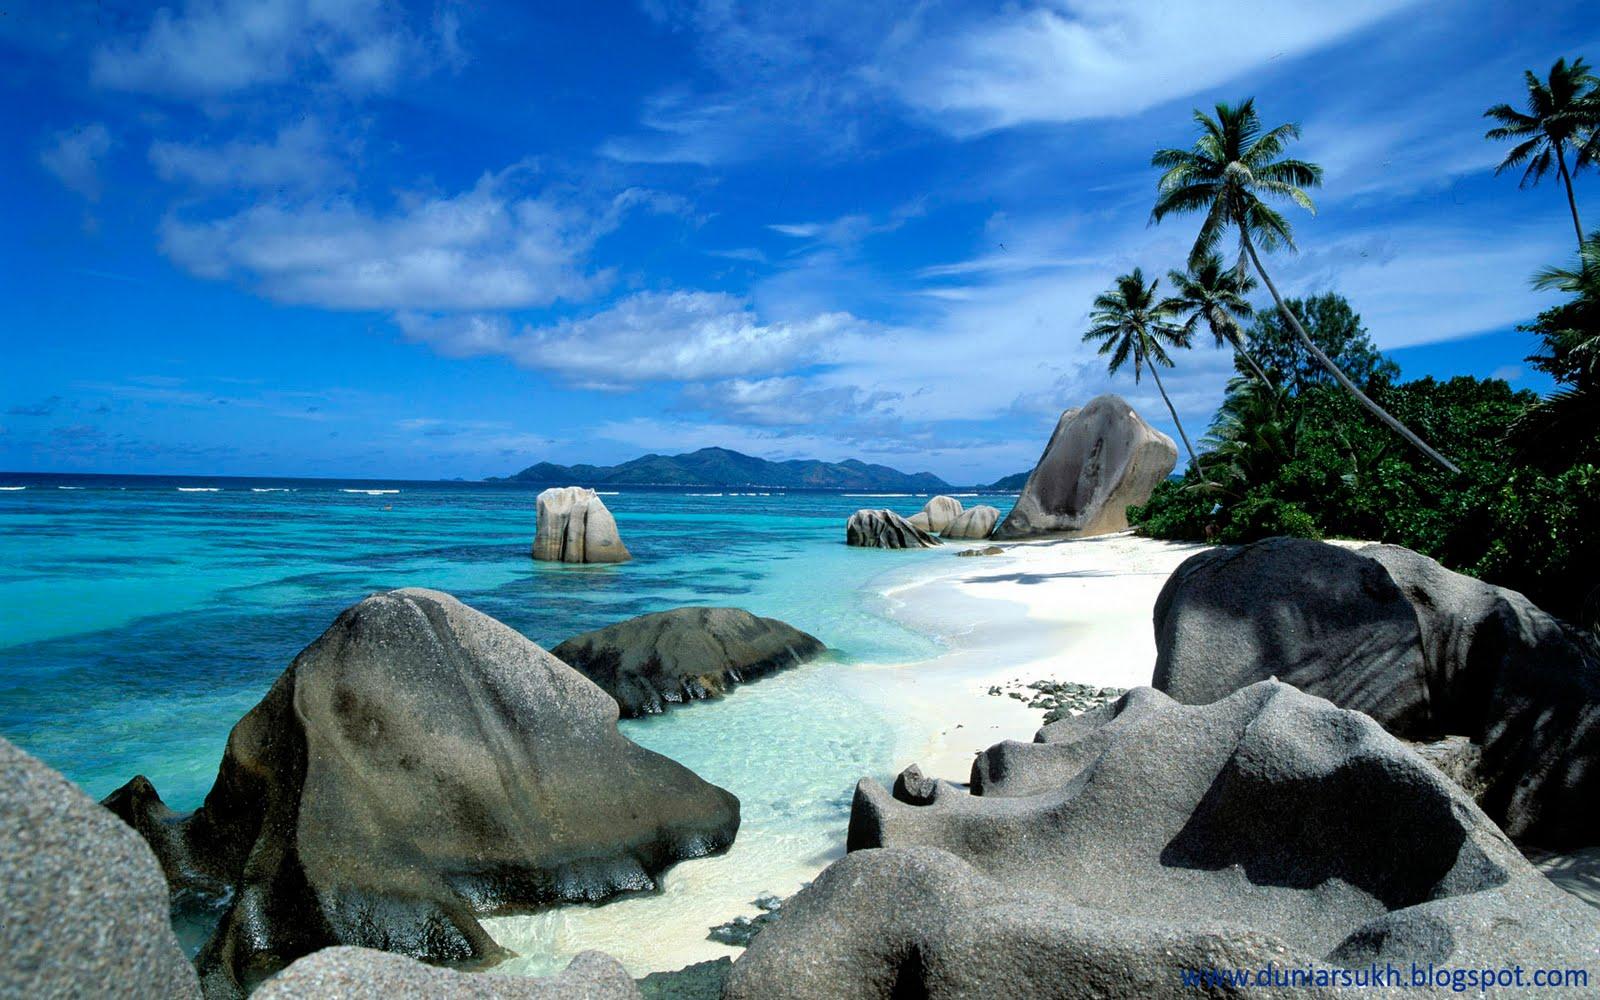 http://2.bp.blogspot.com/_aTX-Oa7T9y0/S_4pR8aagNI/AAAAAAAAAEs/9saCcjqWrXQ/s1600/1273910739_1920x1200_summer-island.jpg